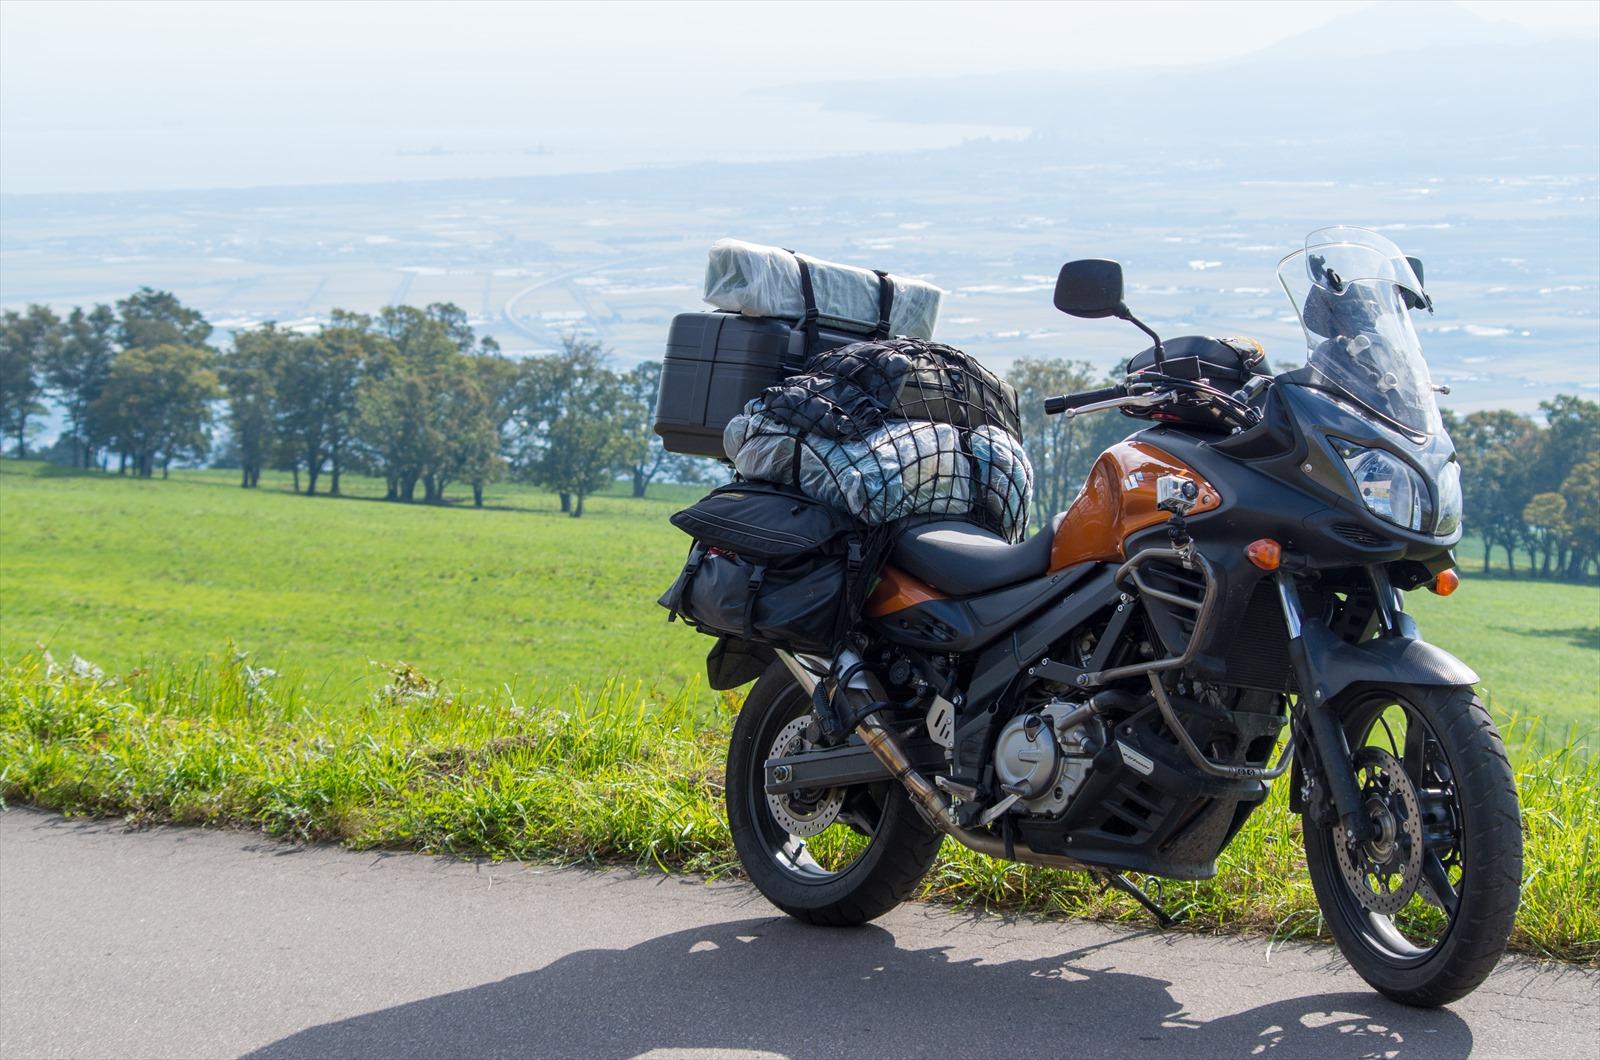 V-ストローム650(スズキ) 中古バイク一覧 ...